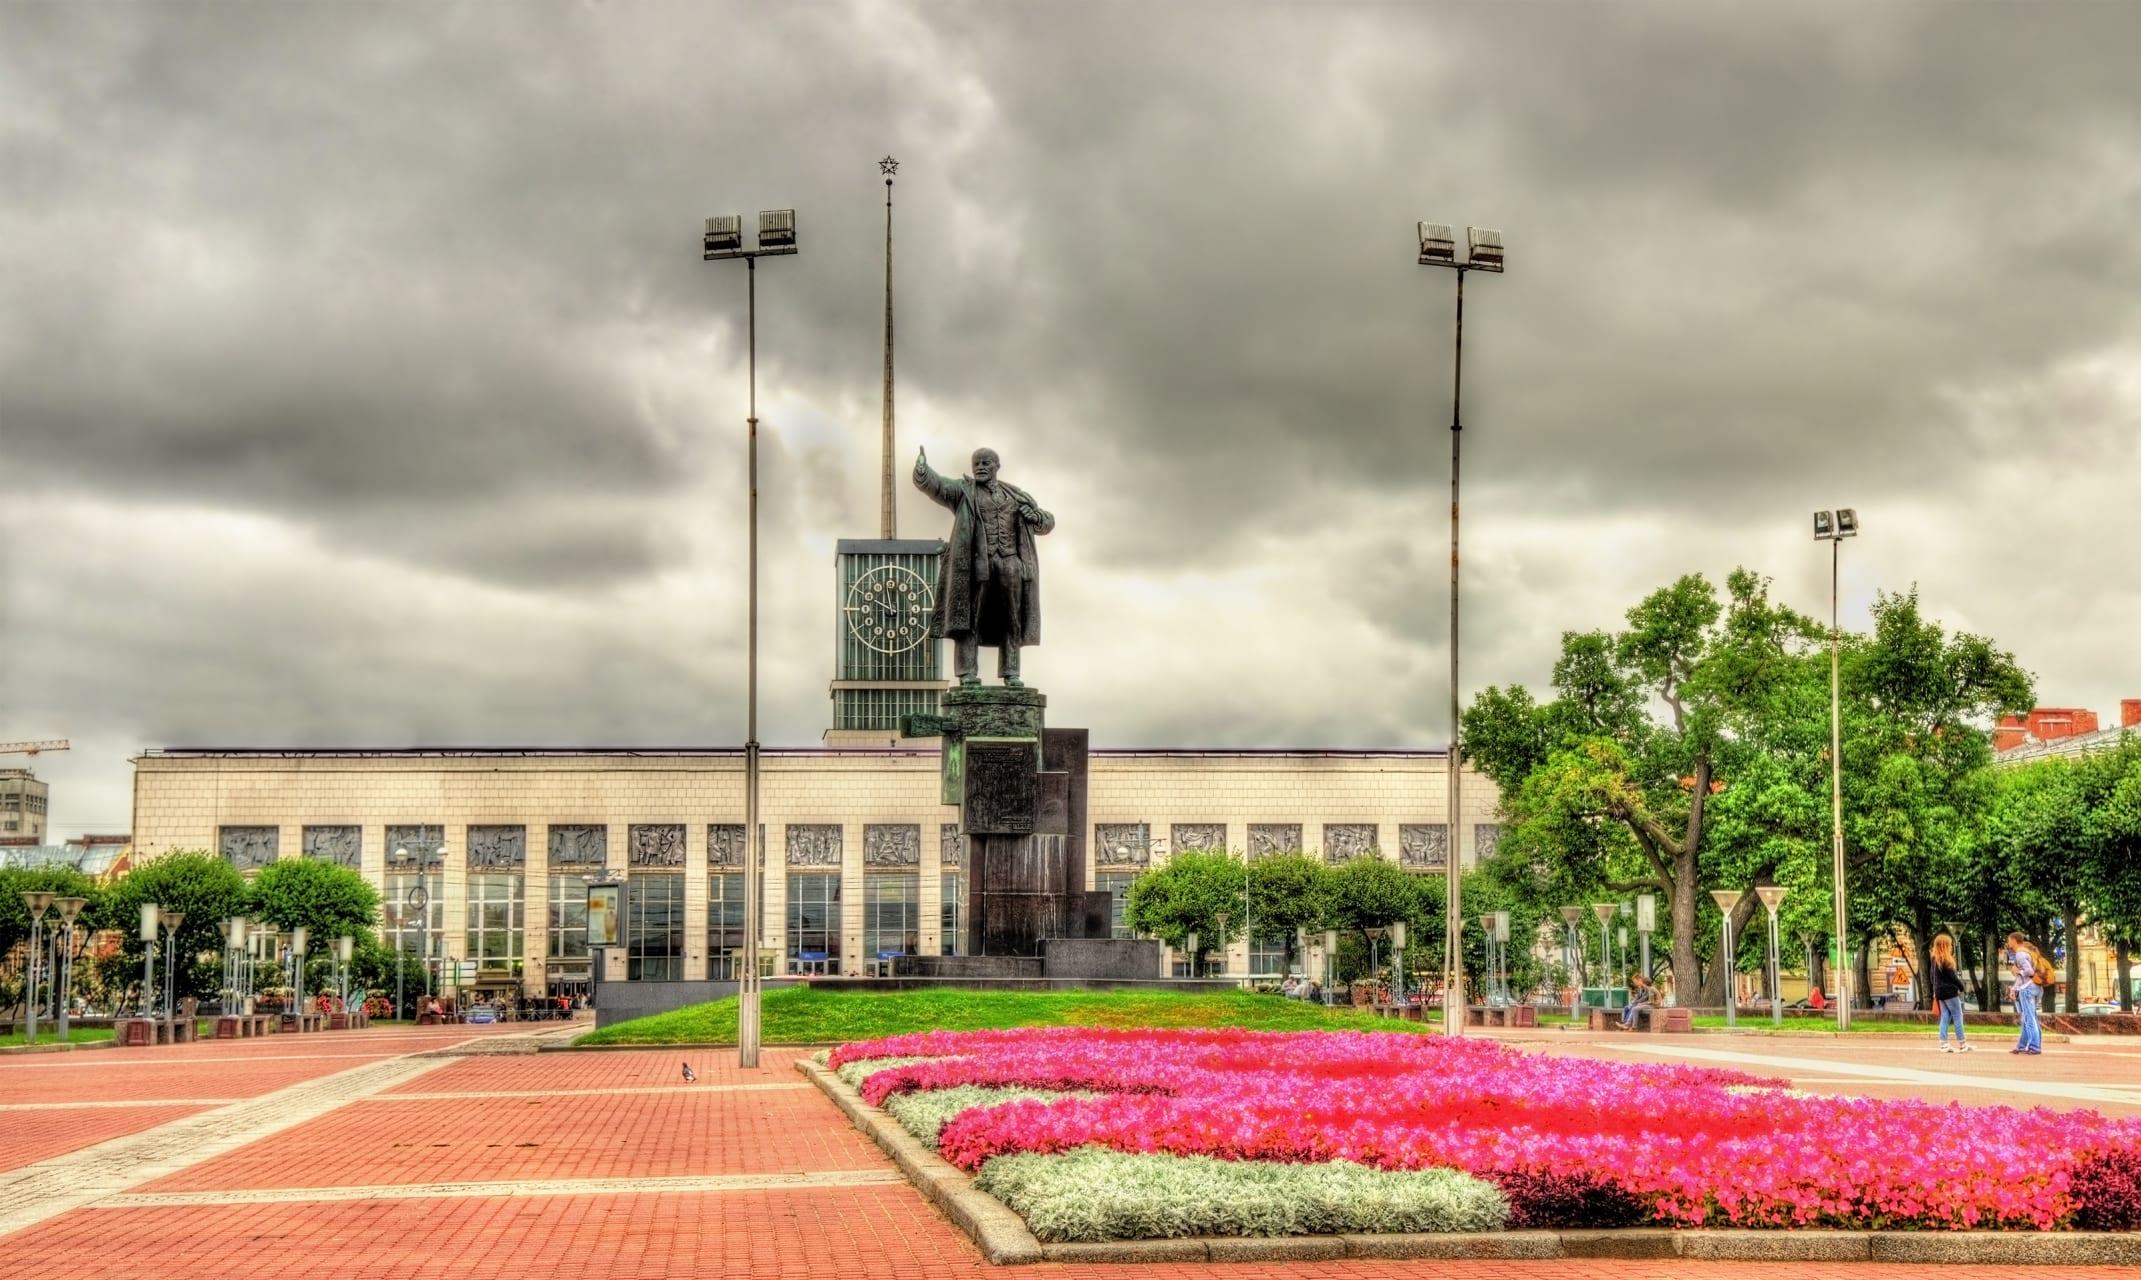 Saint Petersburg - Revolution Series: Finland Railway Station